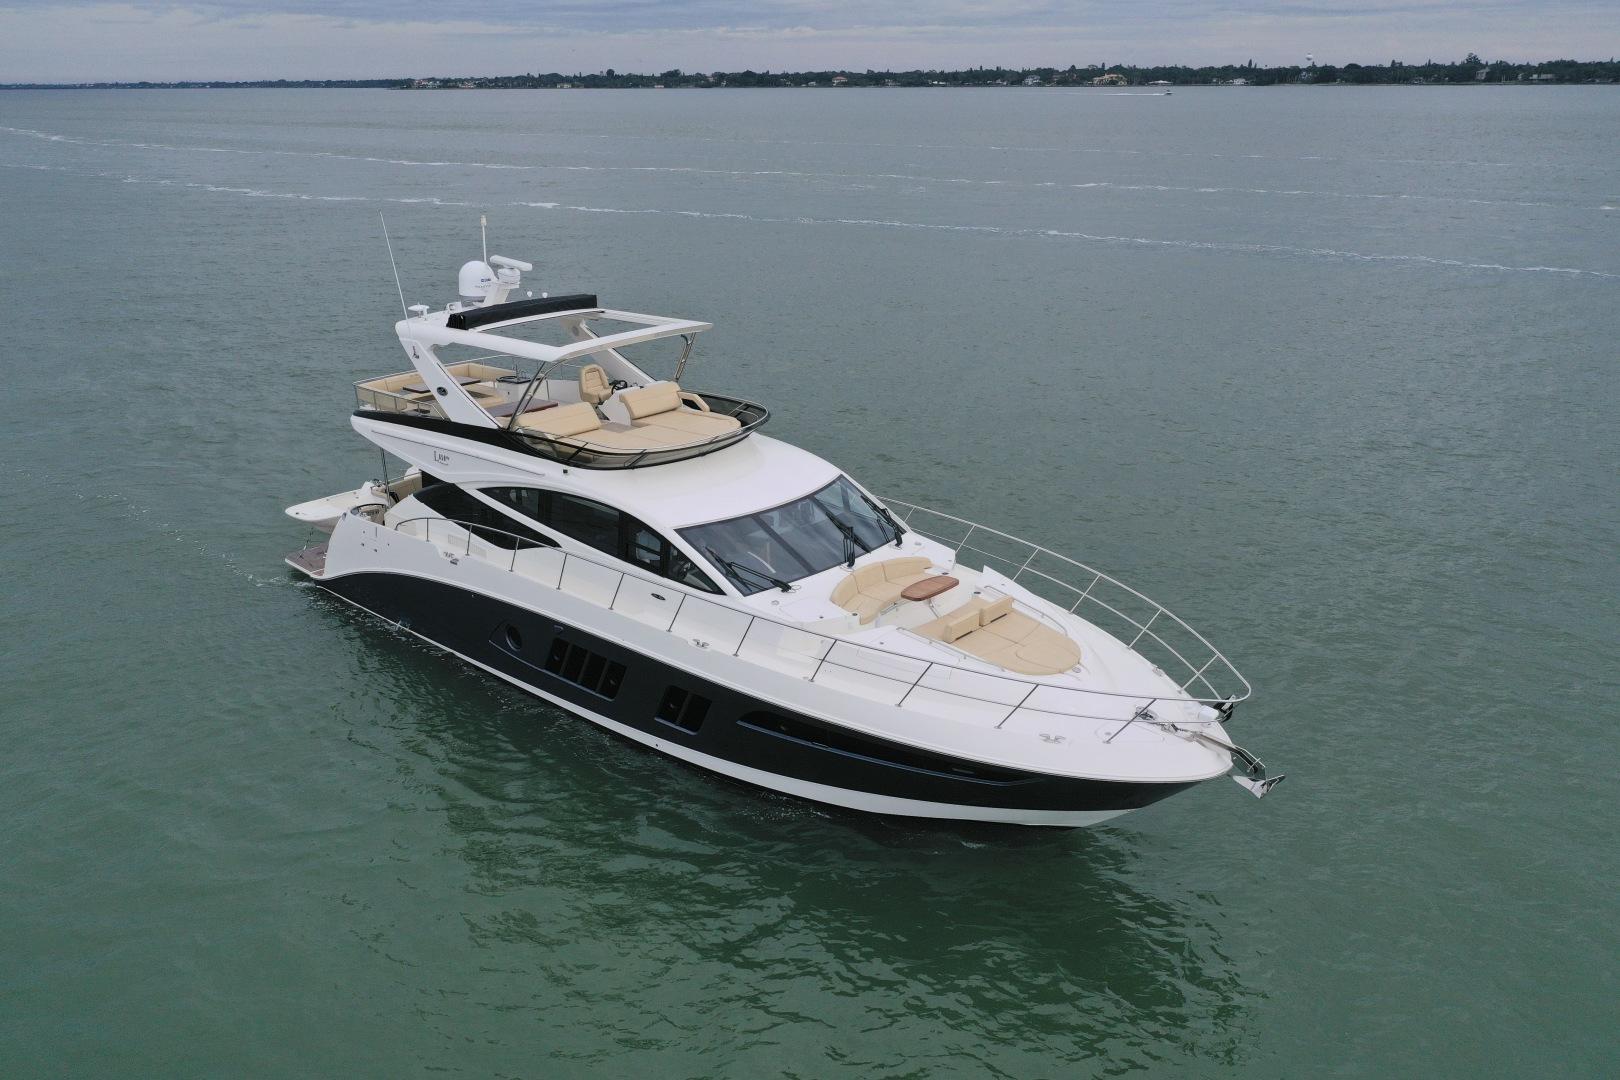 Sea Ray-L650 2016-3x's the Charm Longboat Key-Florida-United States-2016 Sea Ray L650 -1251878 | Thumbnail